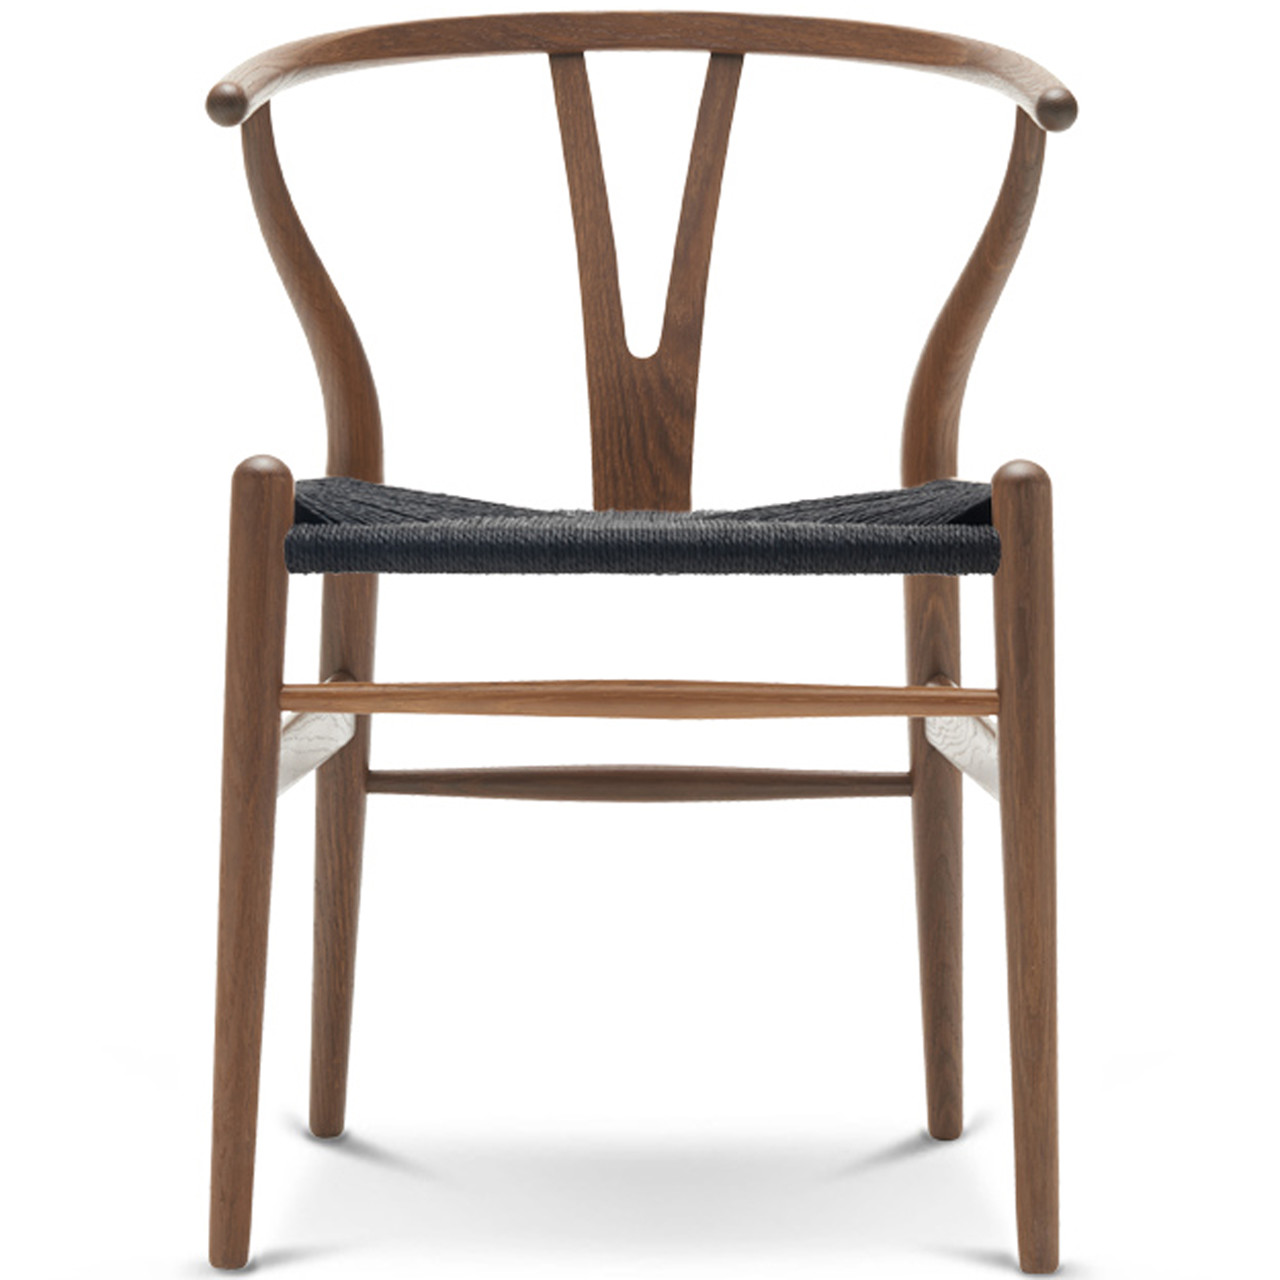 carl hansen ch24 y stolen. Black Bedroom Furniture Sets. Home Design Ideas